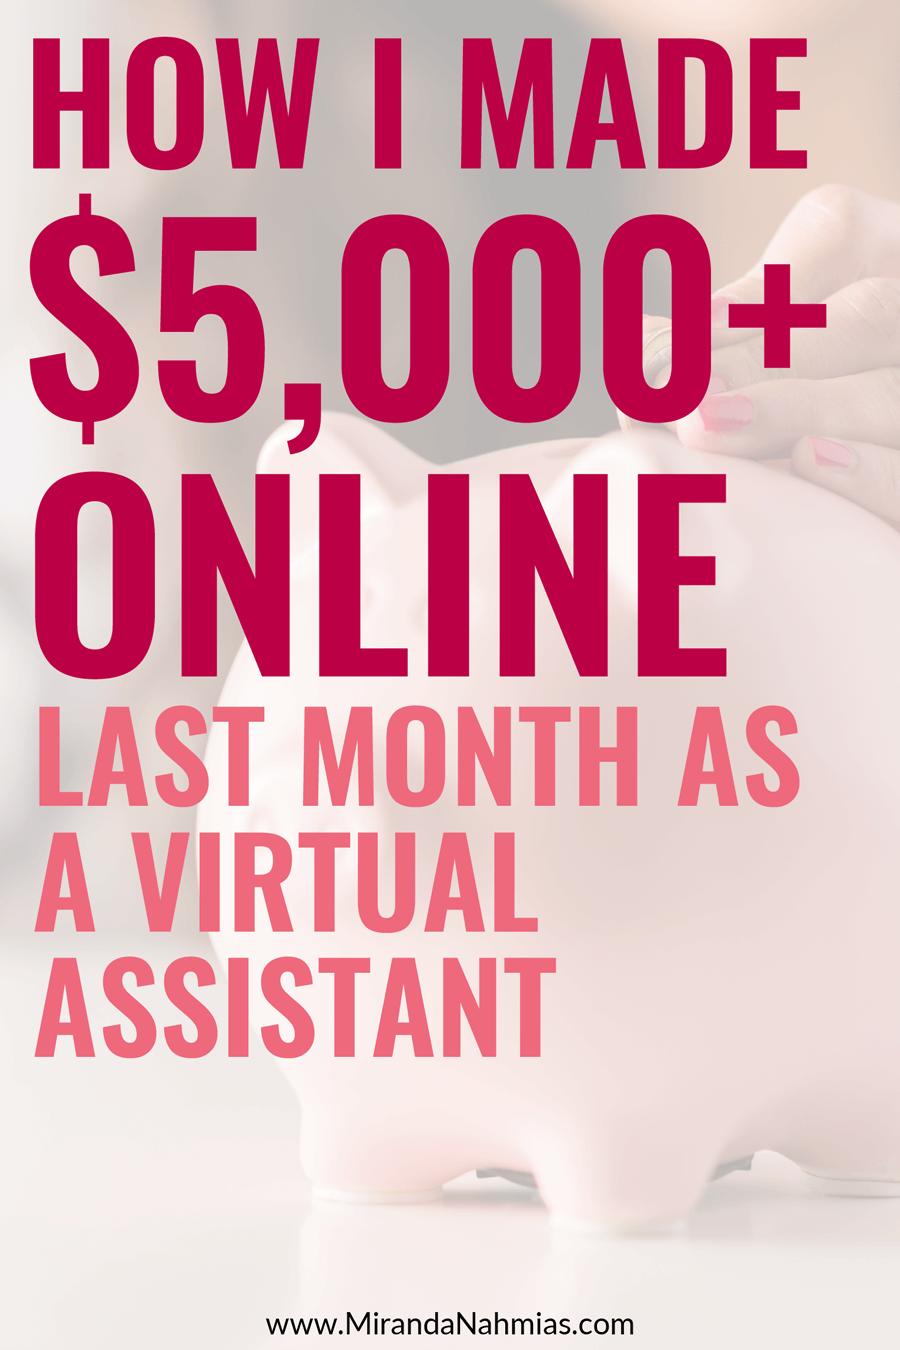 How I Made $5,000+ Online Last Month as a Virtual Assistant // Miranda Nahmias